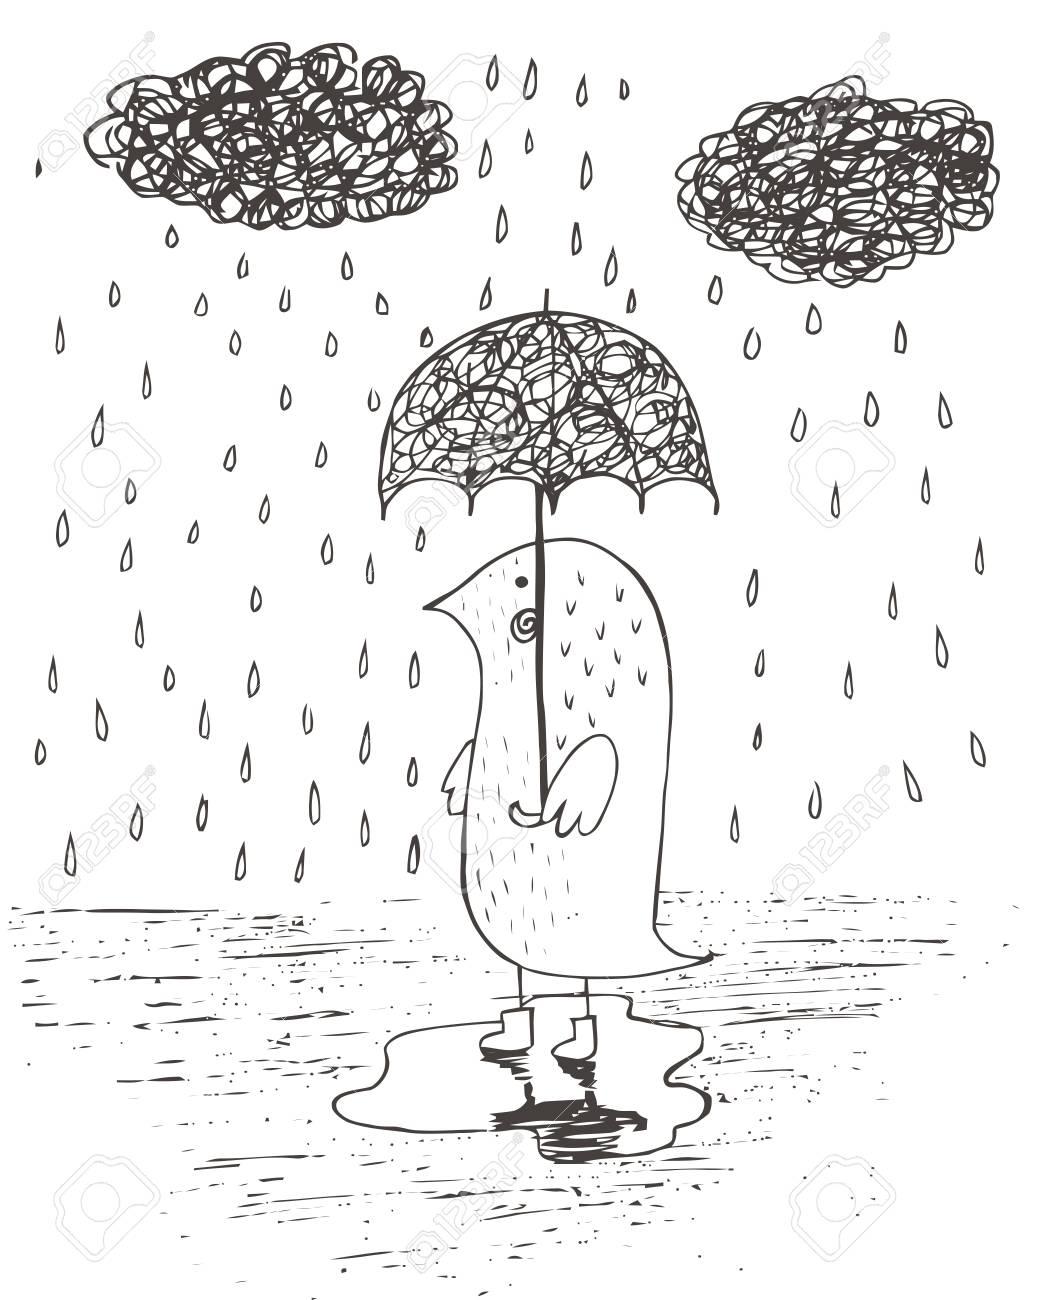 Rain Drawing : drawing, Umbrella, Under, Rain., Drawing, Cartoon, Sketch, Illustration.., Royalty, Cliparts,, Vectors,, Stock, Illustration., Image, 67830445.